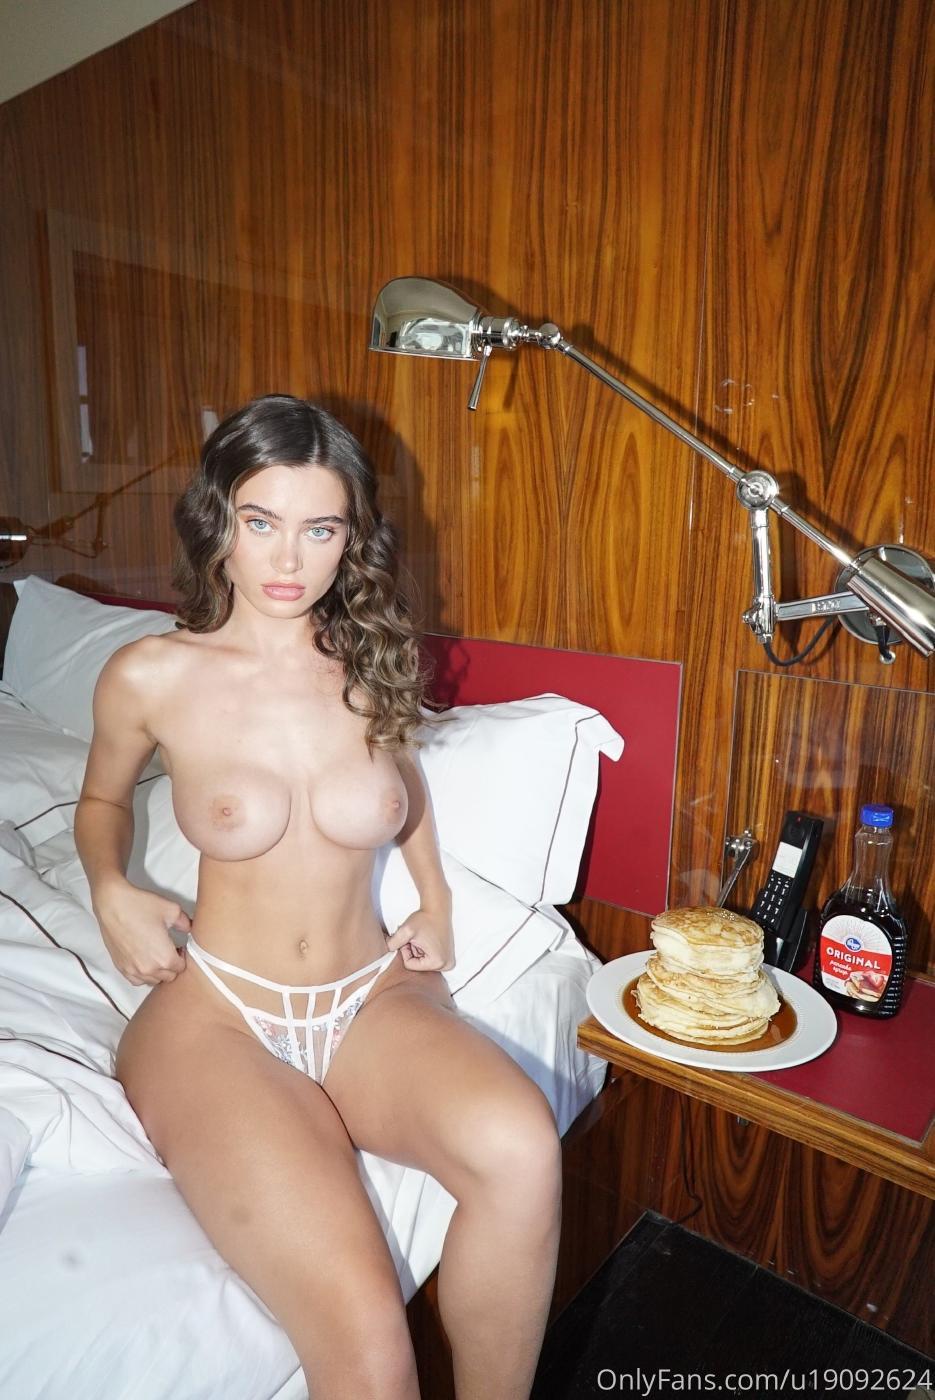 Lana Rhoades Nude Lingerie Strip Onlyfans Set Leaked Amfzad